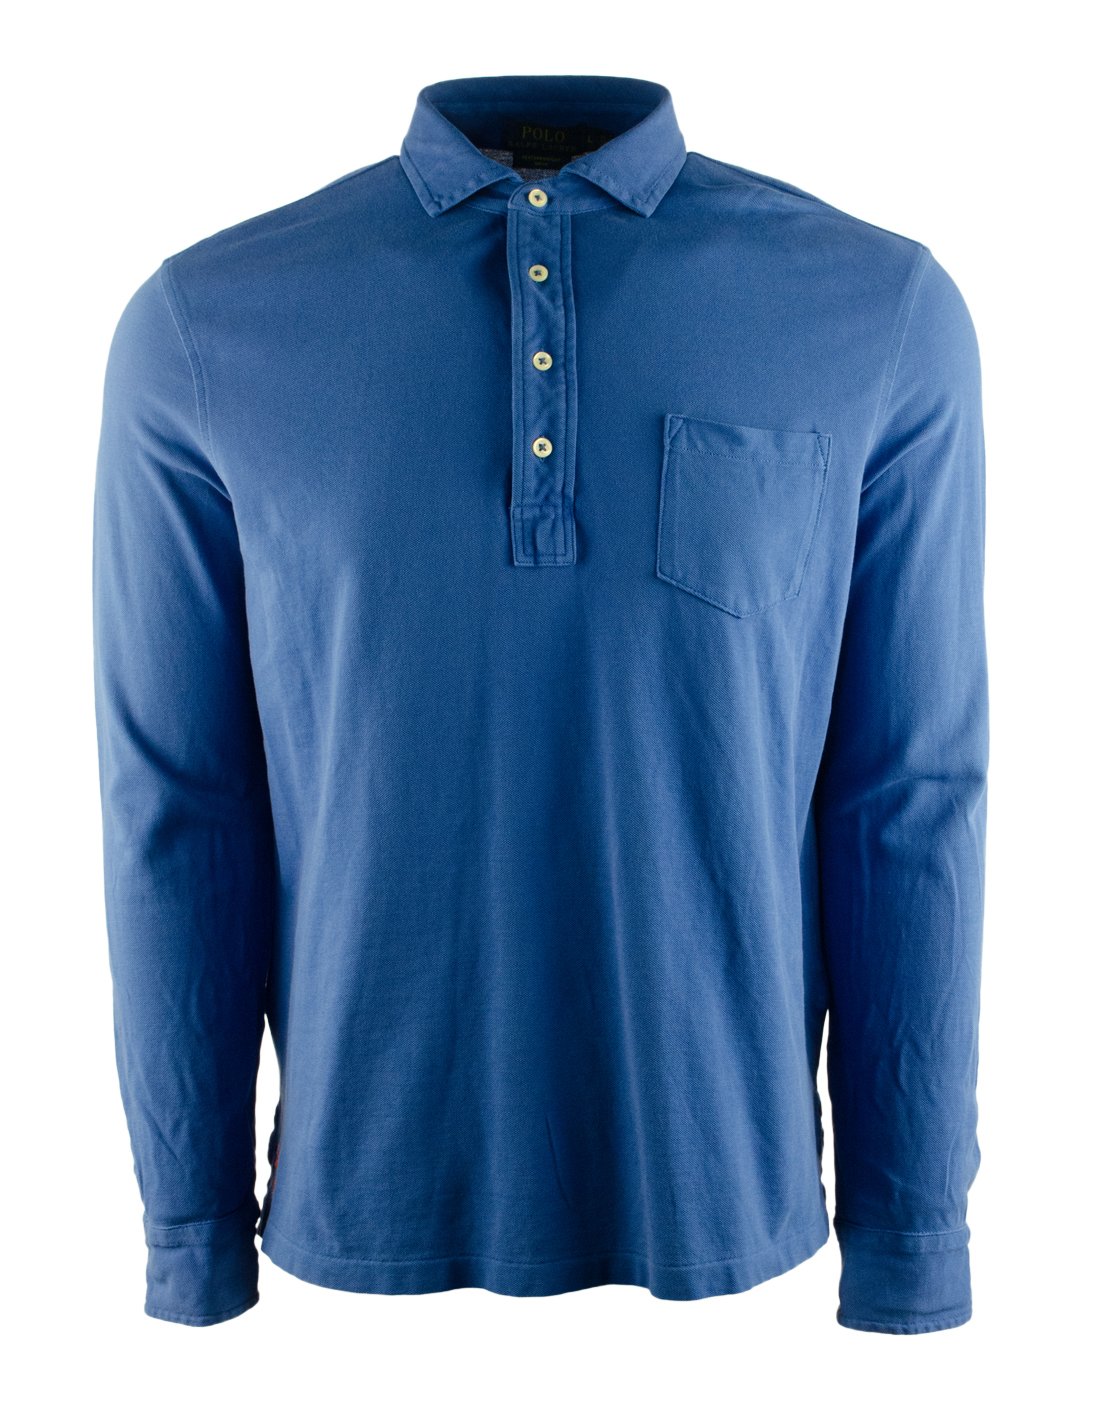 Polo ralph lauren men 39 s featherweight mesh long sleeve for Men s lightweight long sleeve polo shirts